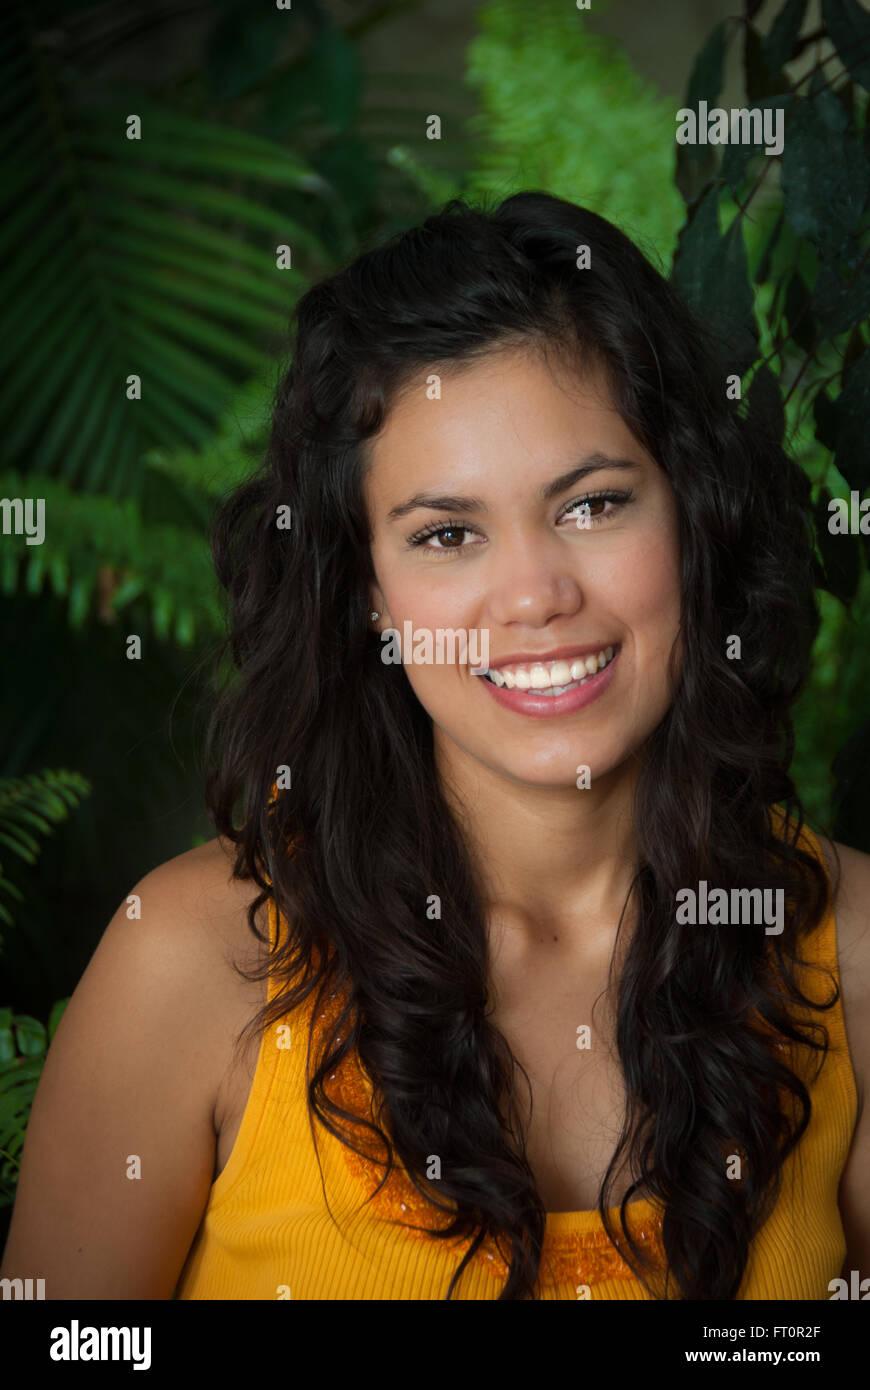 Porträt von lächelnden jungen Hispanic Frau - Puerto Vallarta, Mexiko #613PV Stockfoto